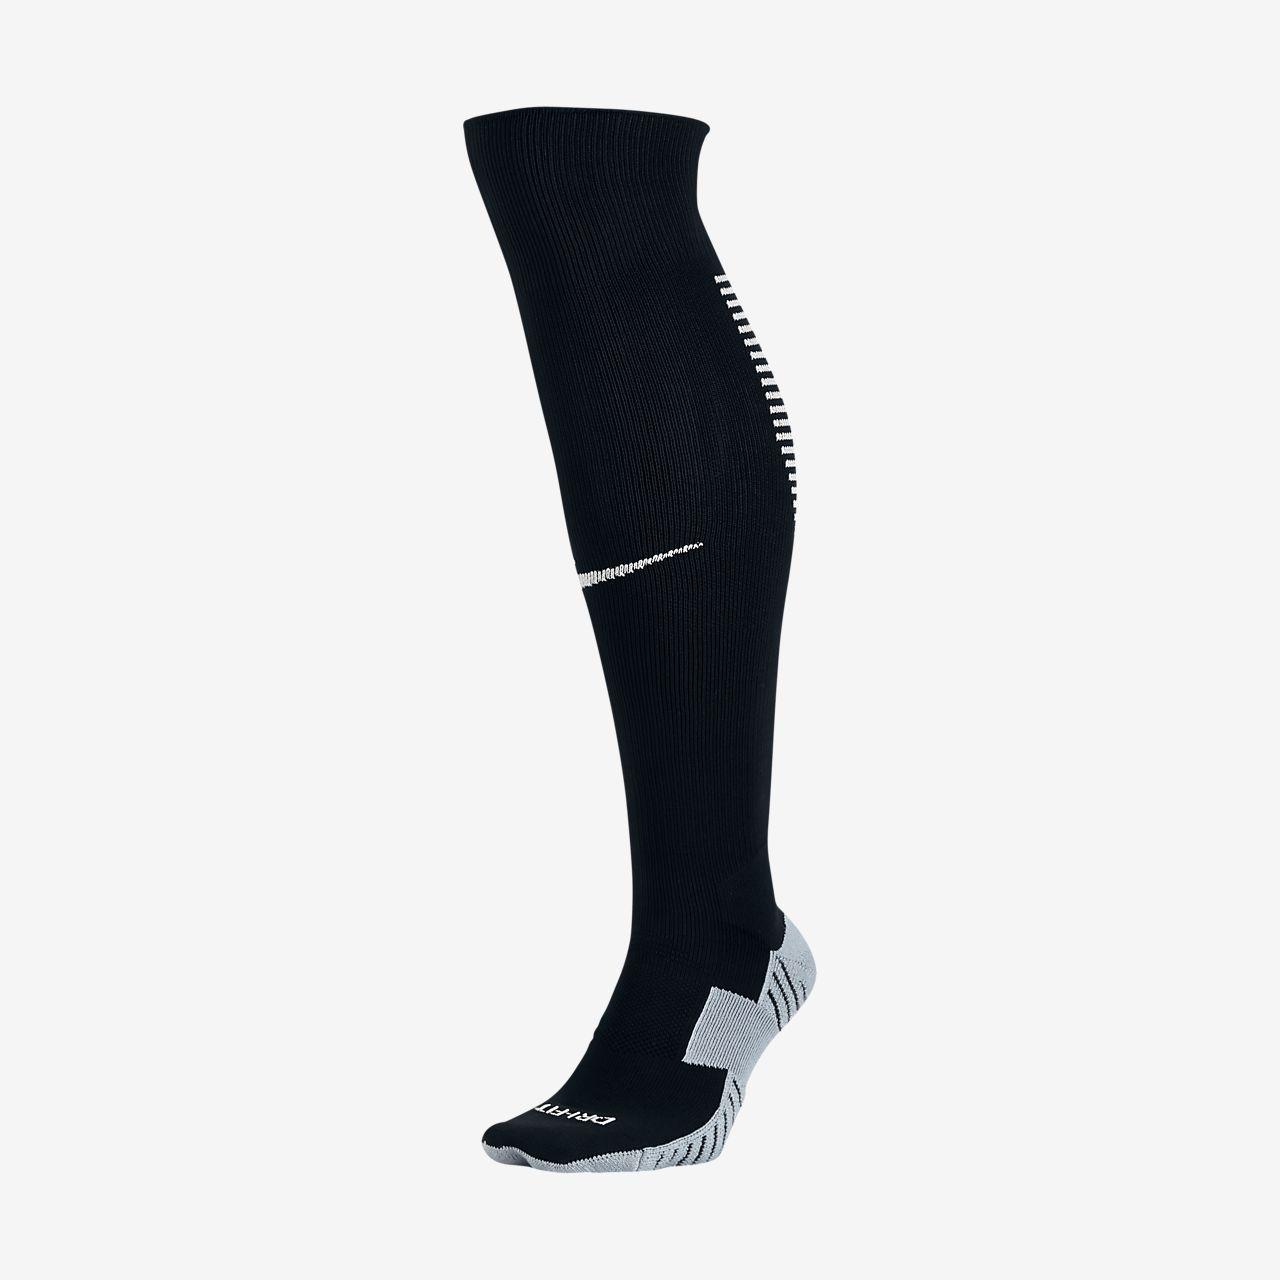 Nike Stadium Over-the-Calf Football Socks